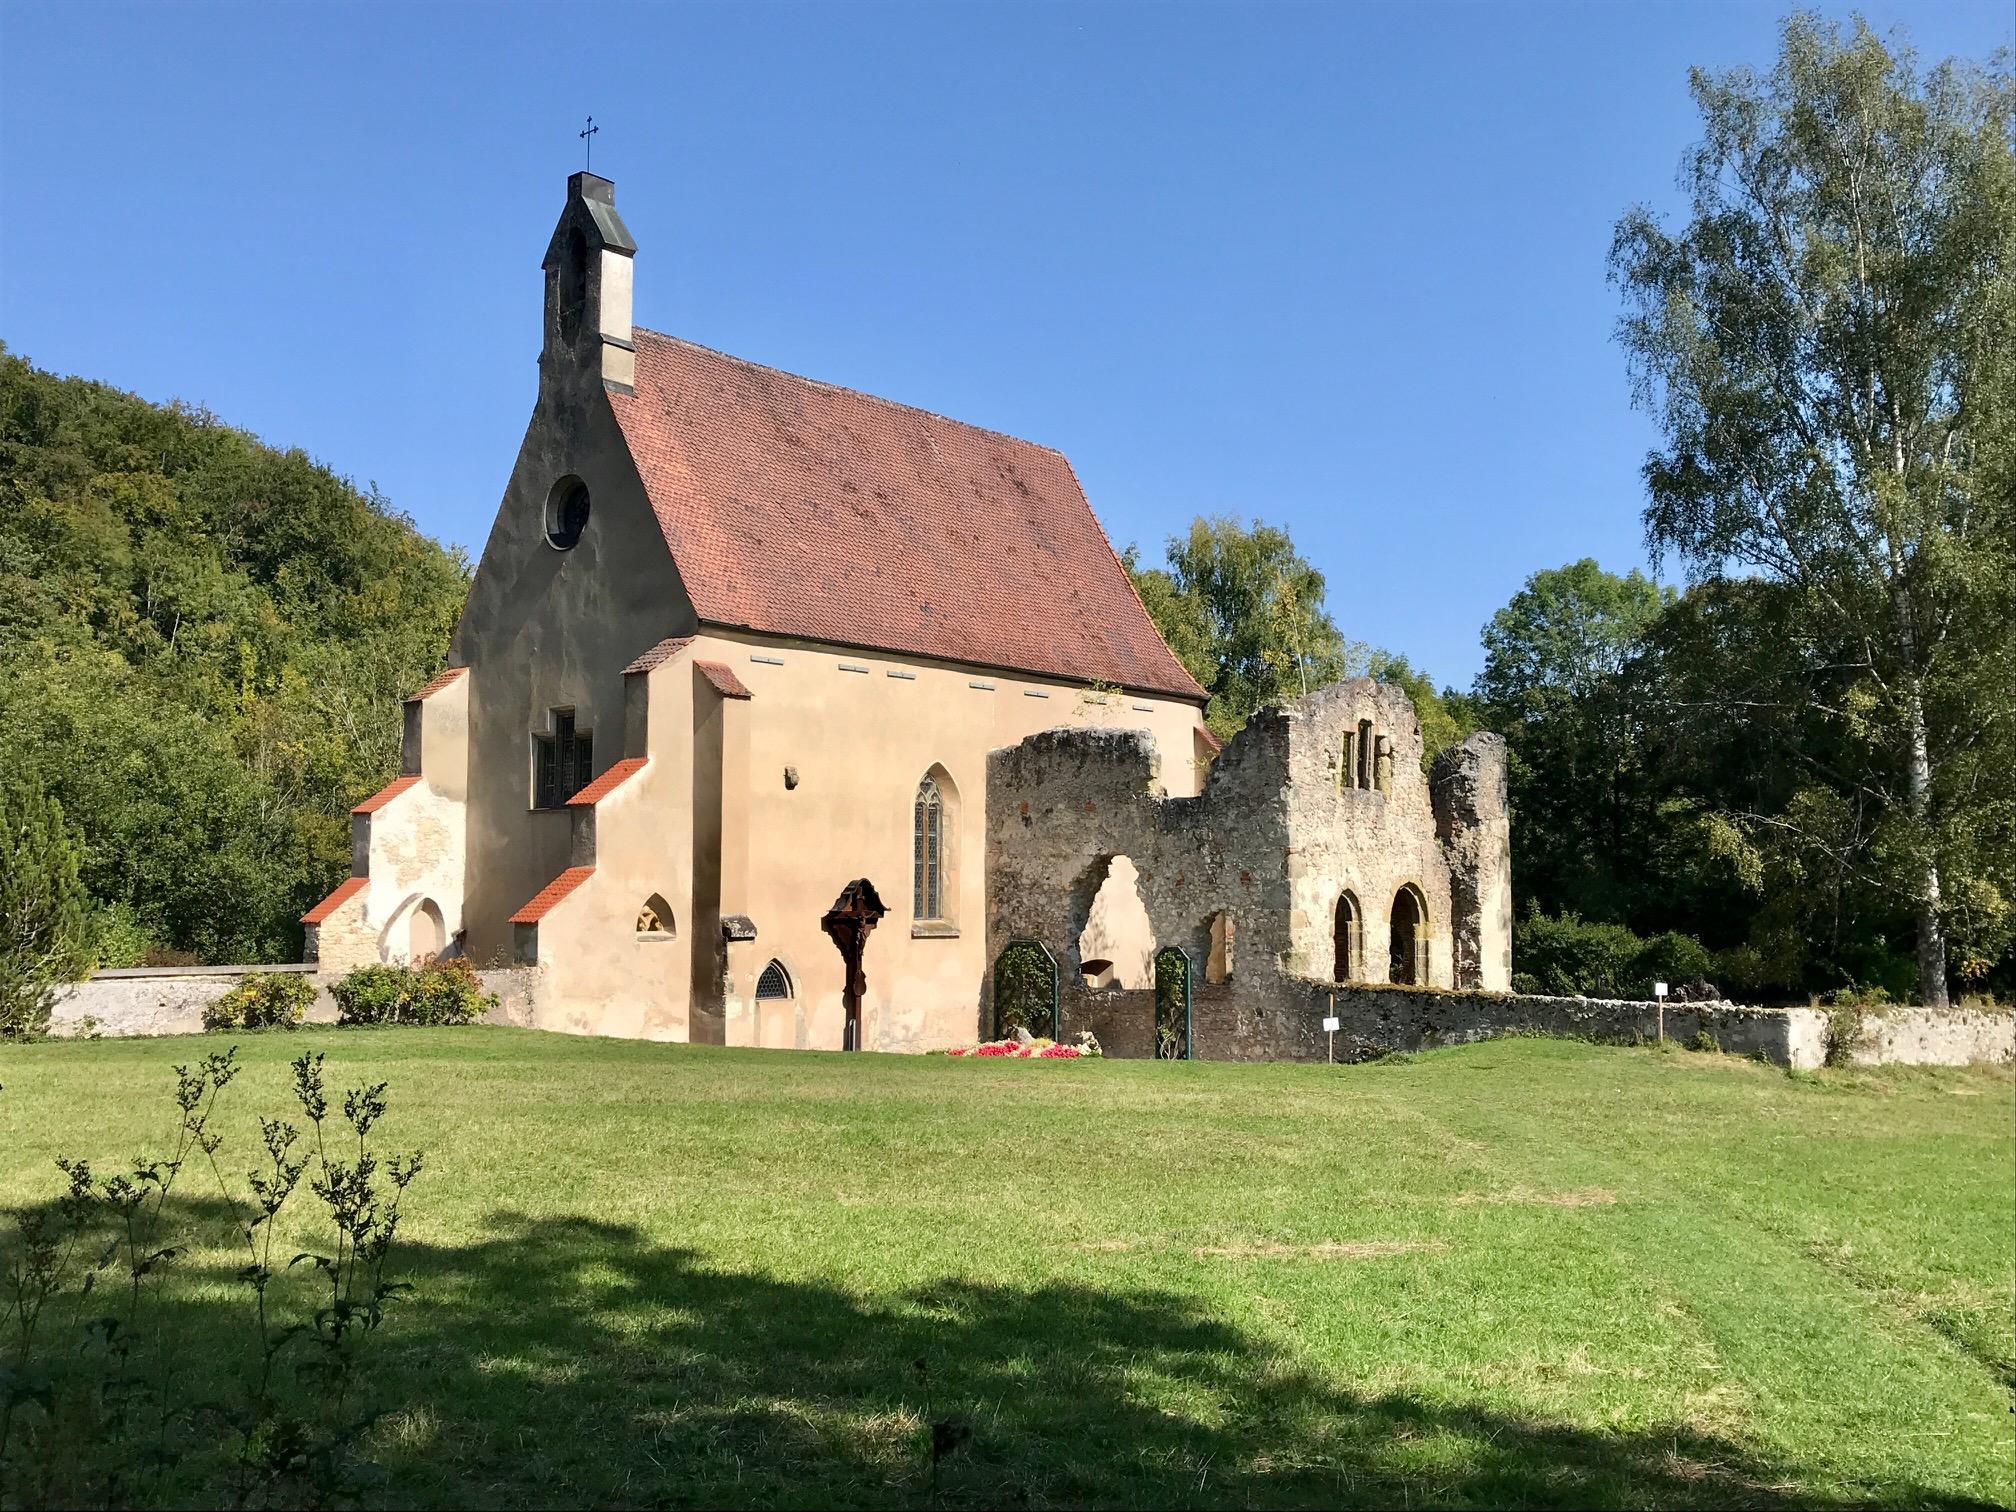 Klosterruine Christgarten, Albsteig HW1, Etappe 2 Mönchsdeggingen - Bopfingen